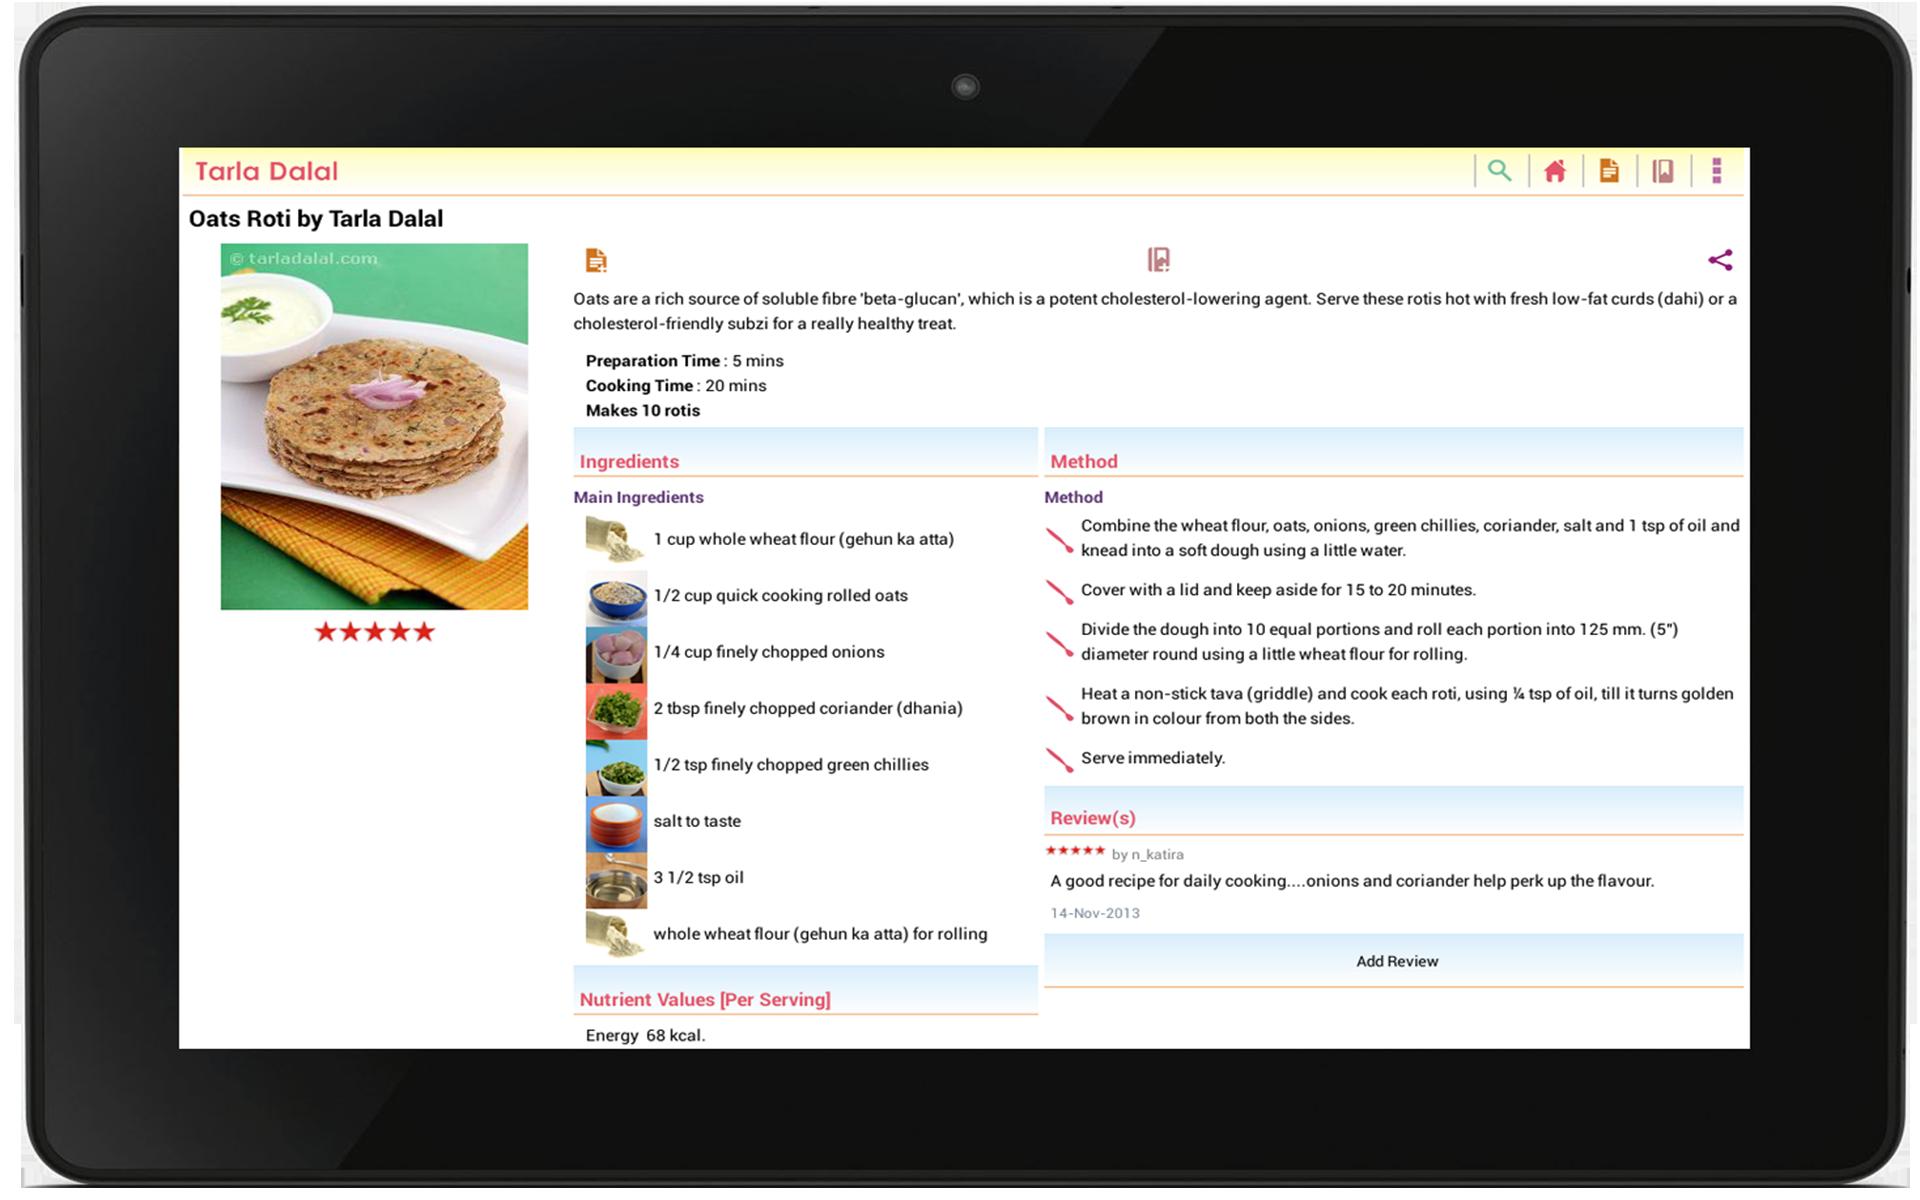 Amazon.com: Tarla Dalal Recipes: Appstore for Android